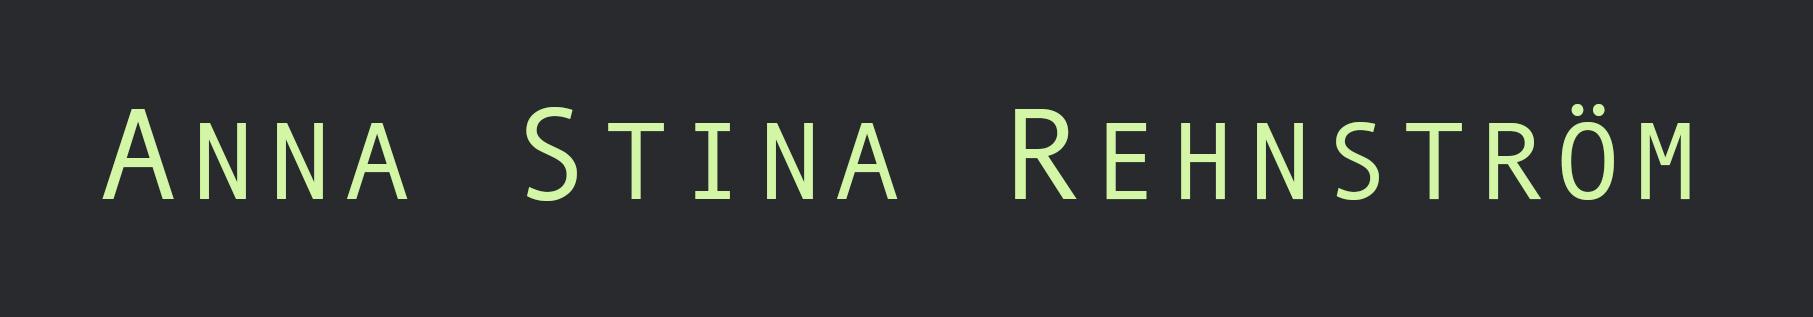 Anna Stina Rehnström Logotyp